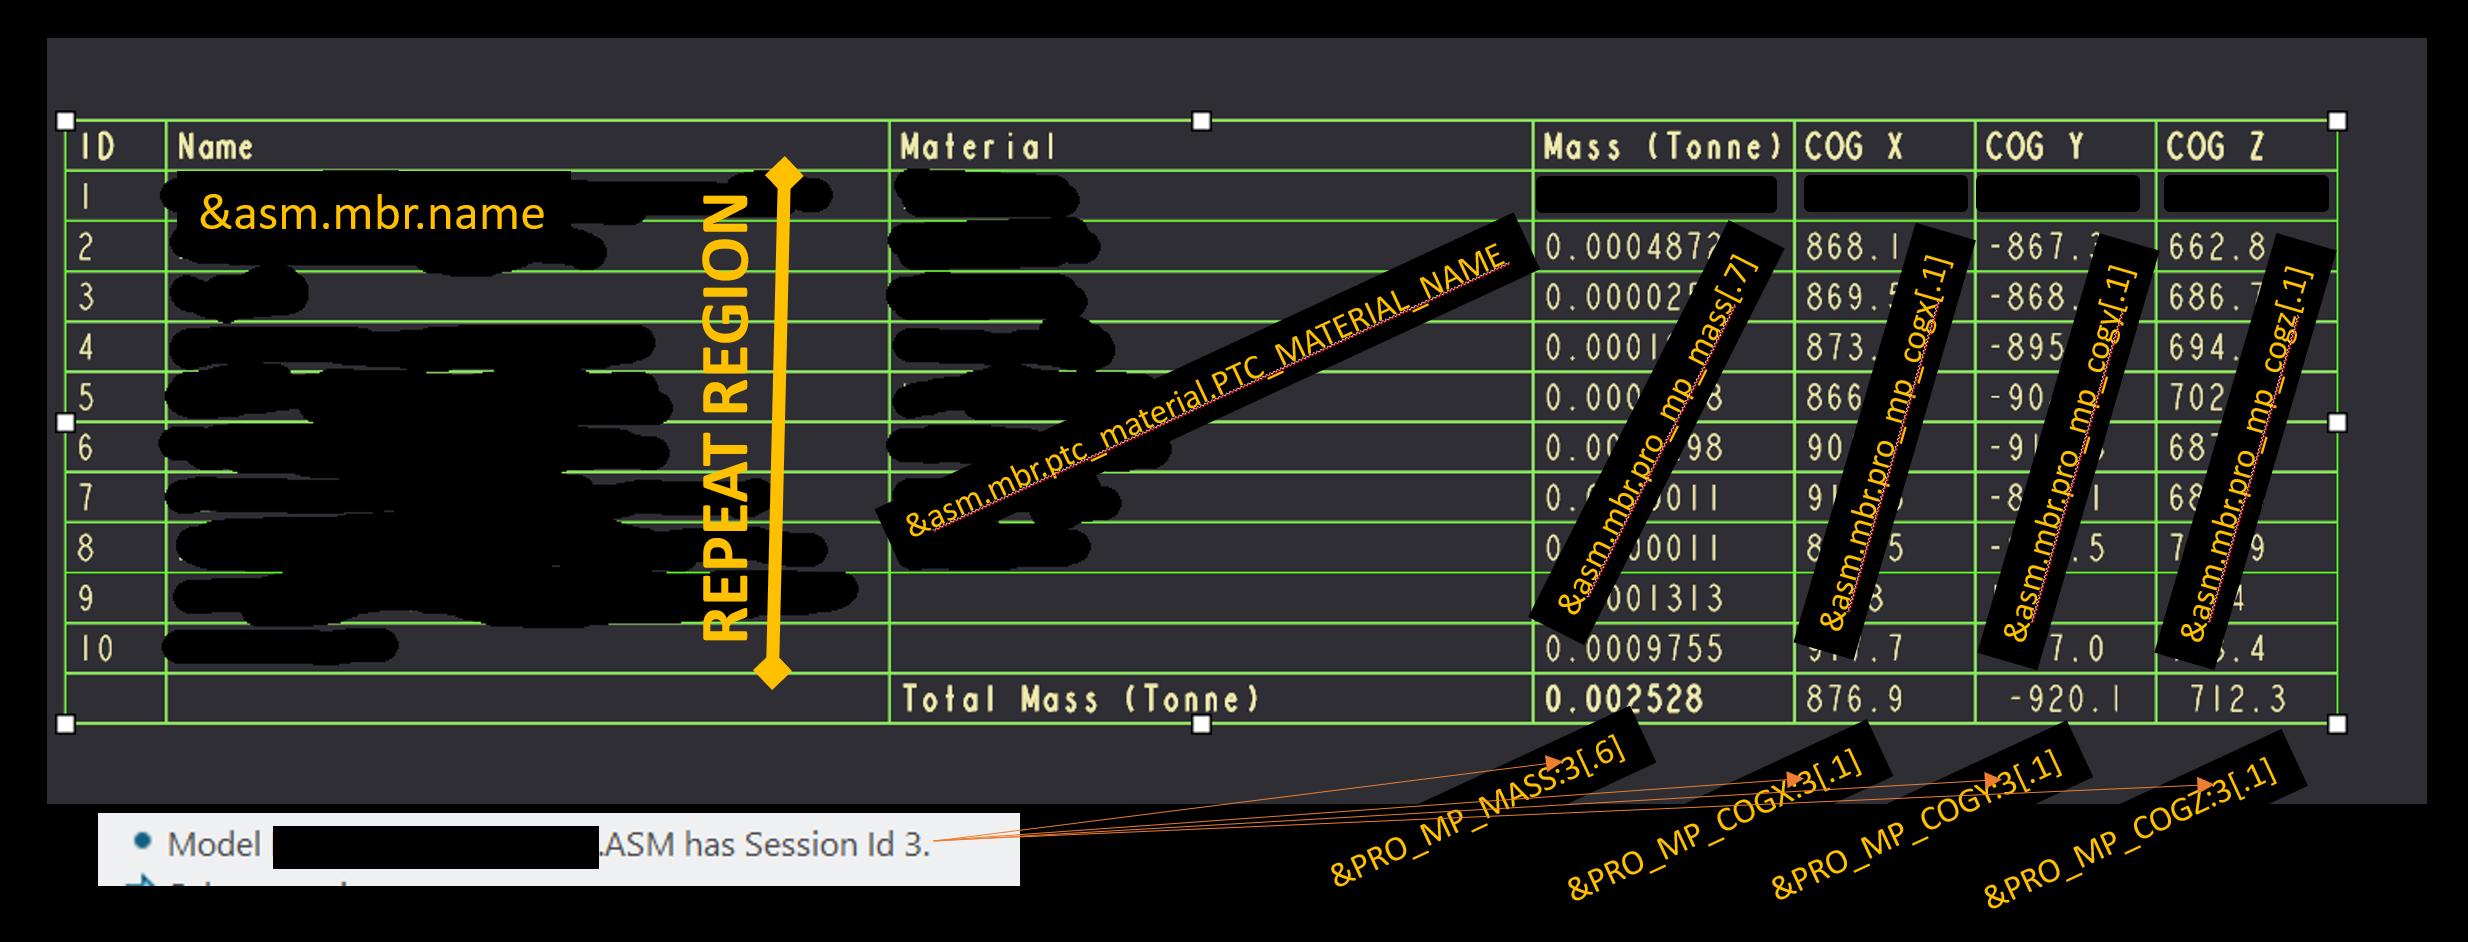 Mass_COG_repeat_region.PNG